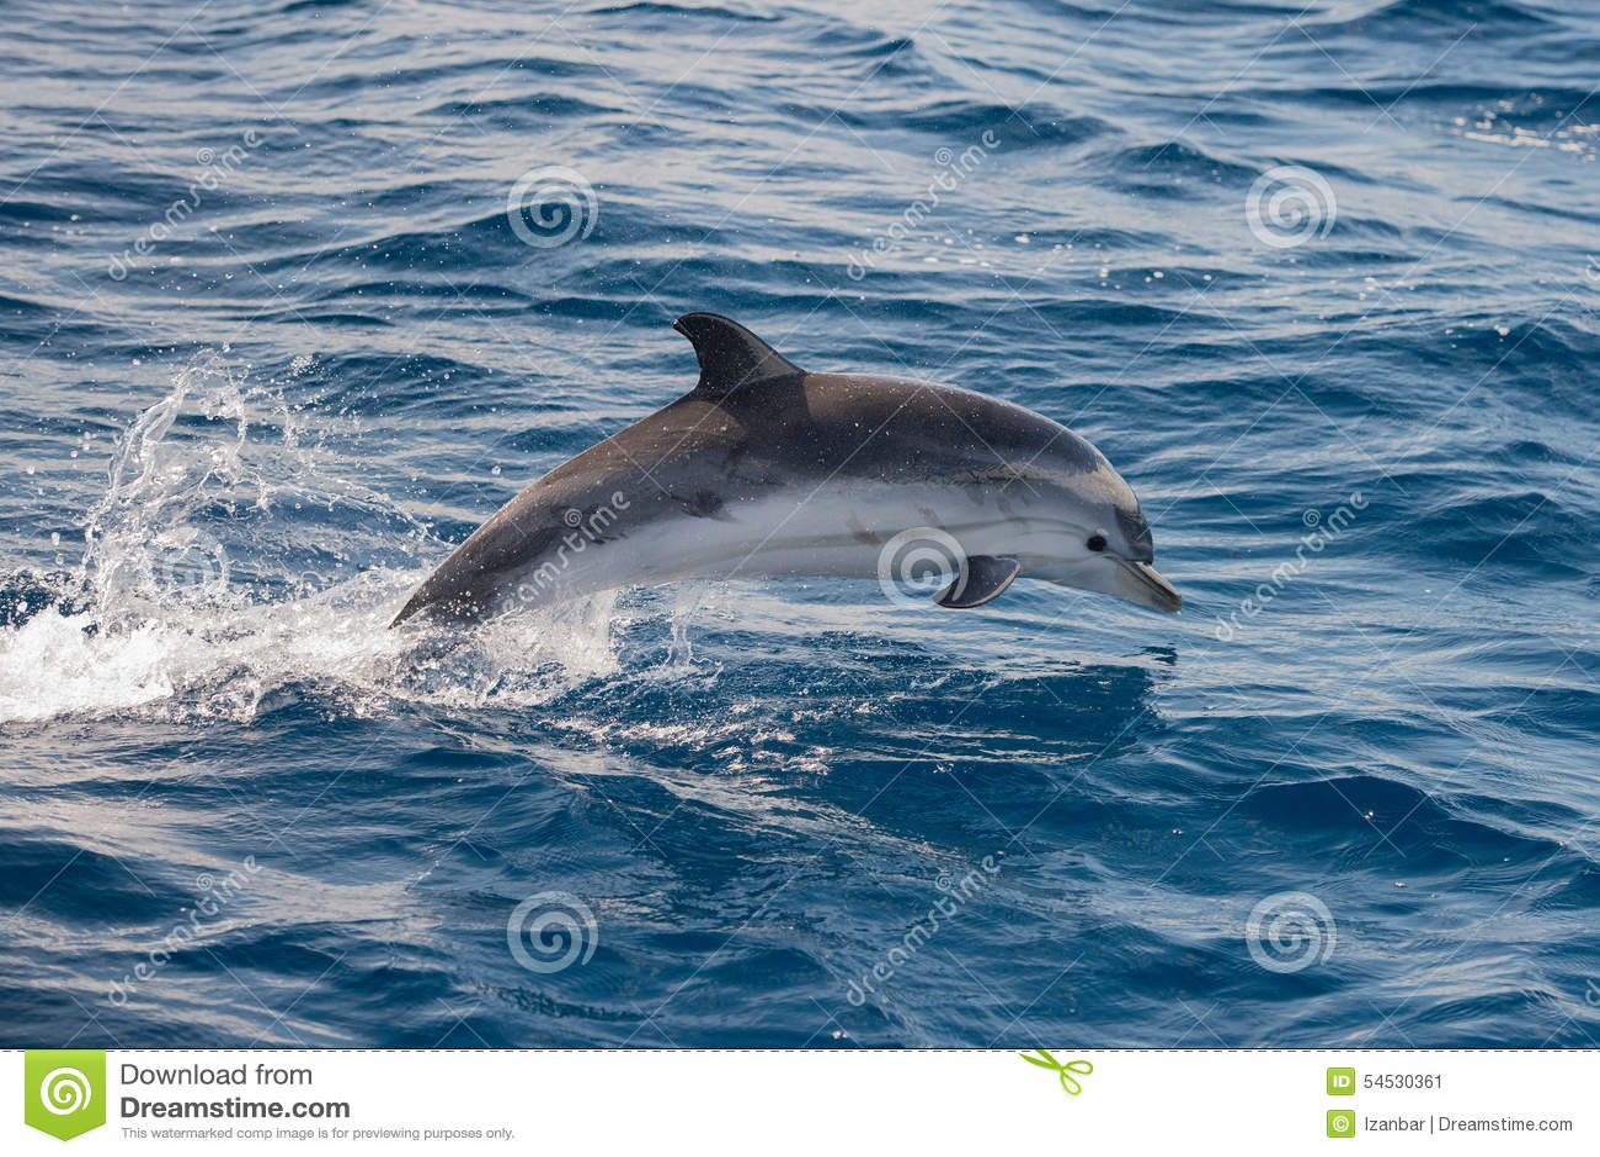 from Jalen deep sea dolphin dildo